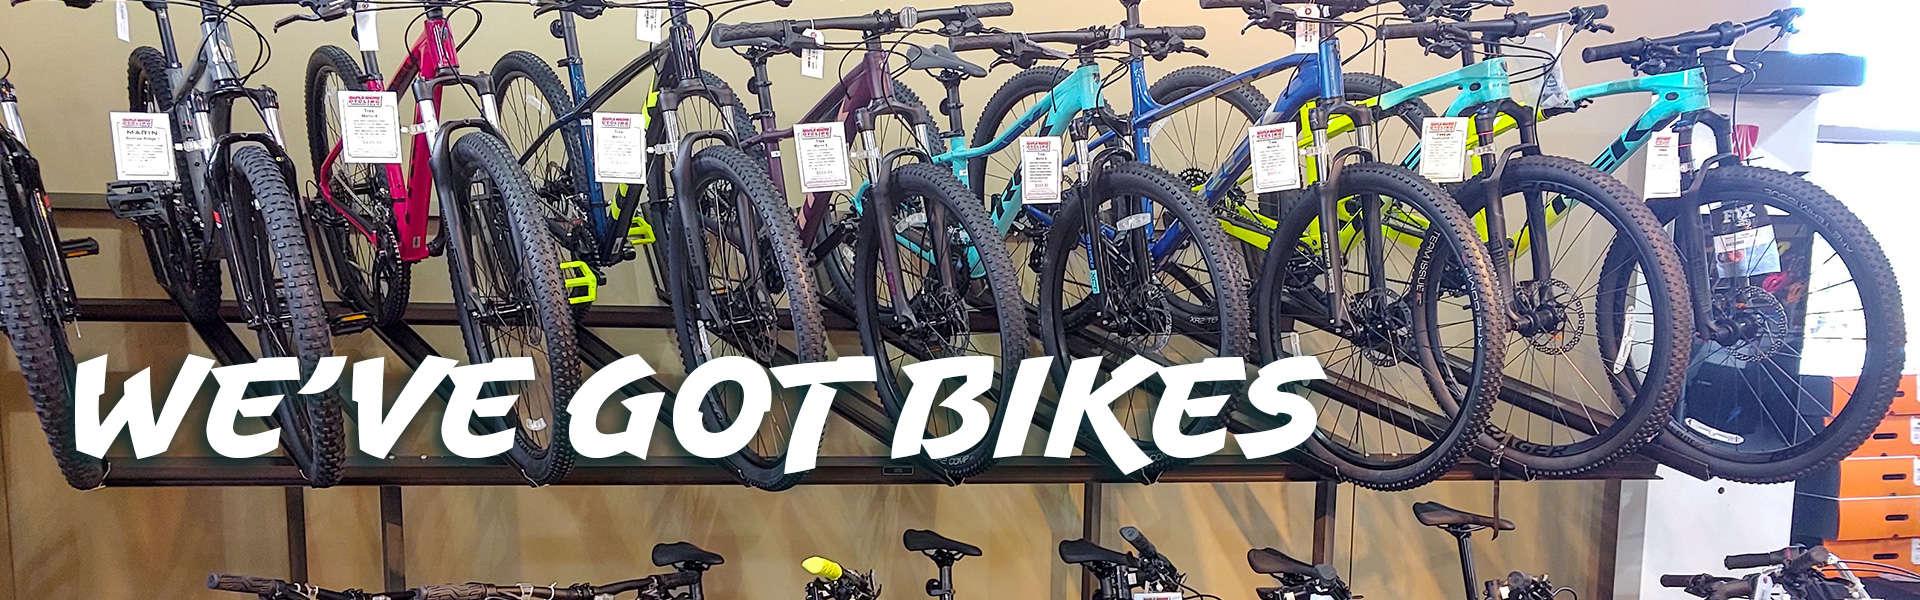 We've Got Mountain Bikes